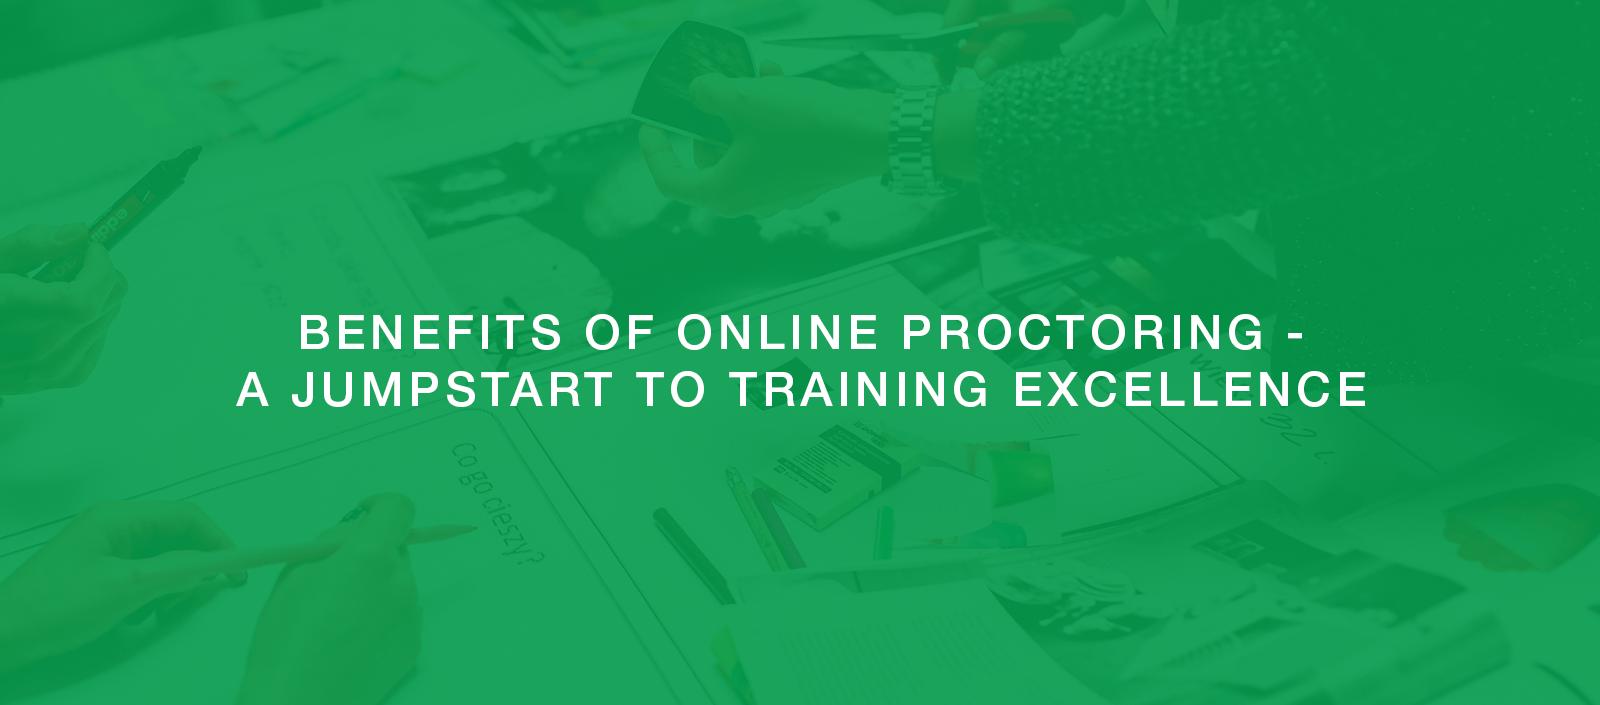 Online proctoring Benefits